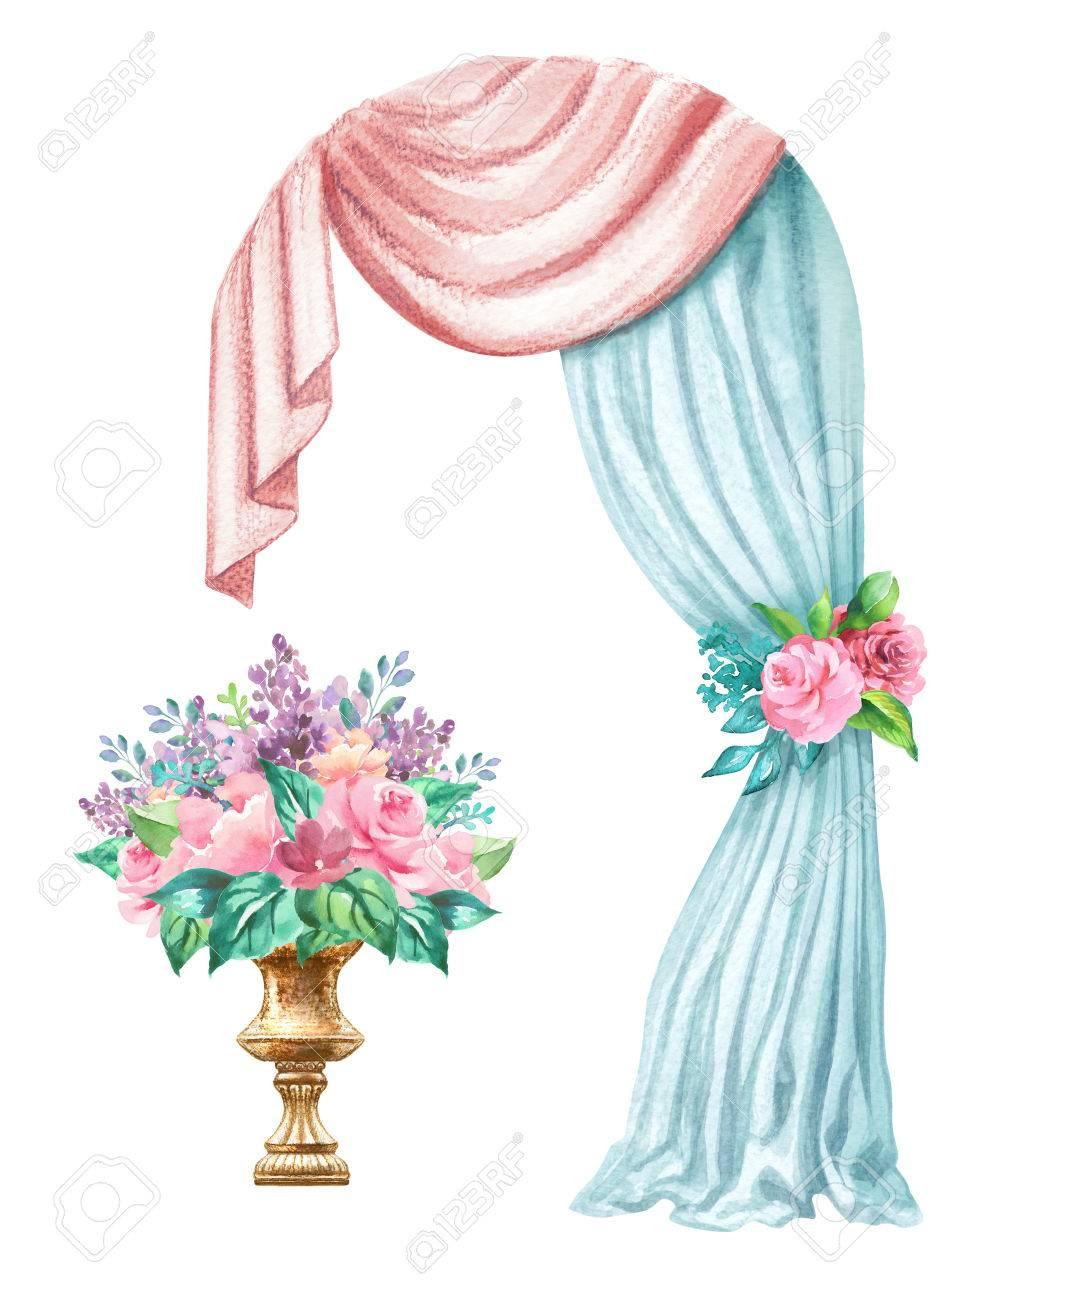 watercolor wedding illustration festive frame decorative arch